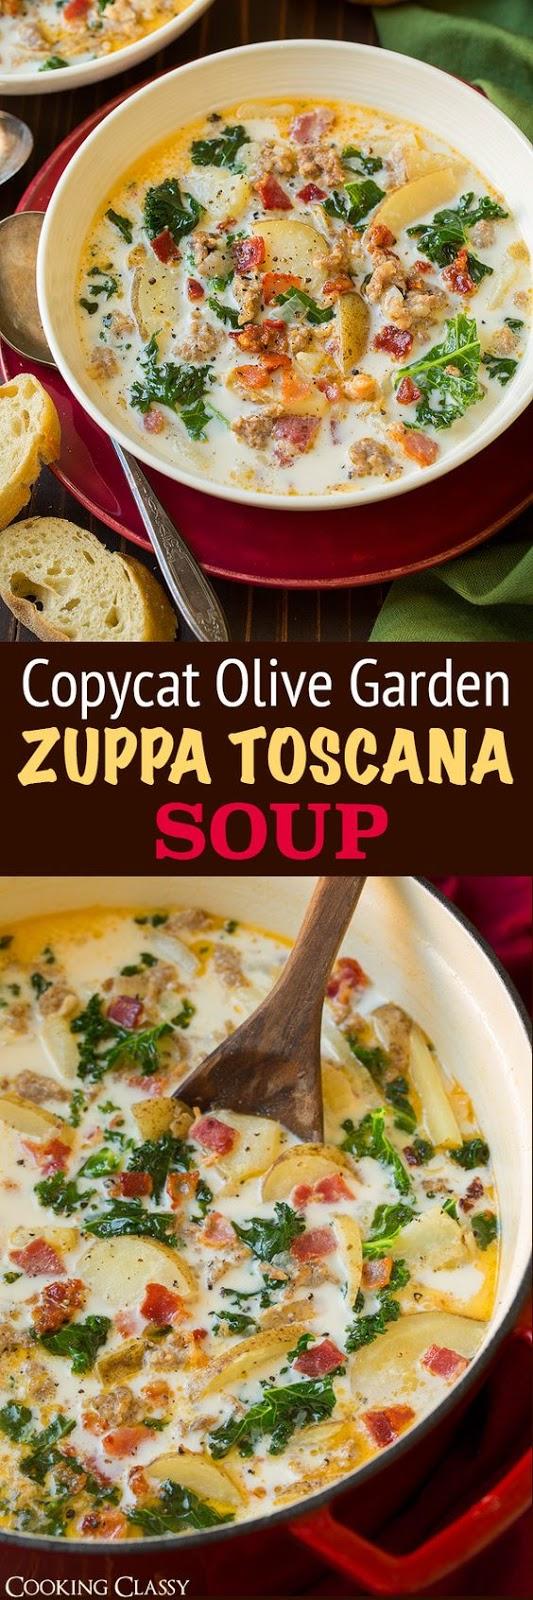 Zuppa Toscana Soup Recipe